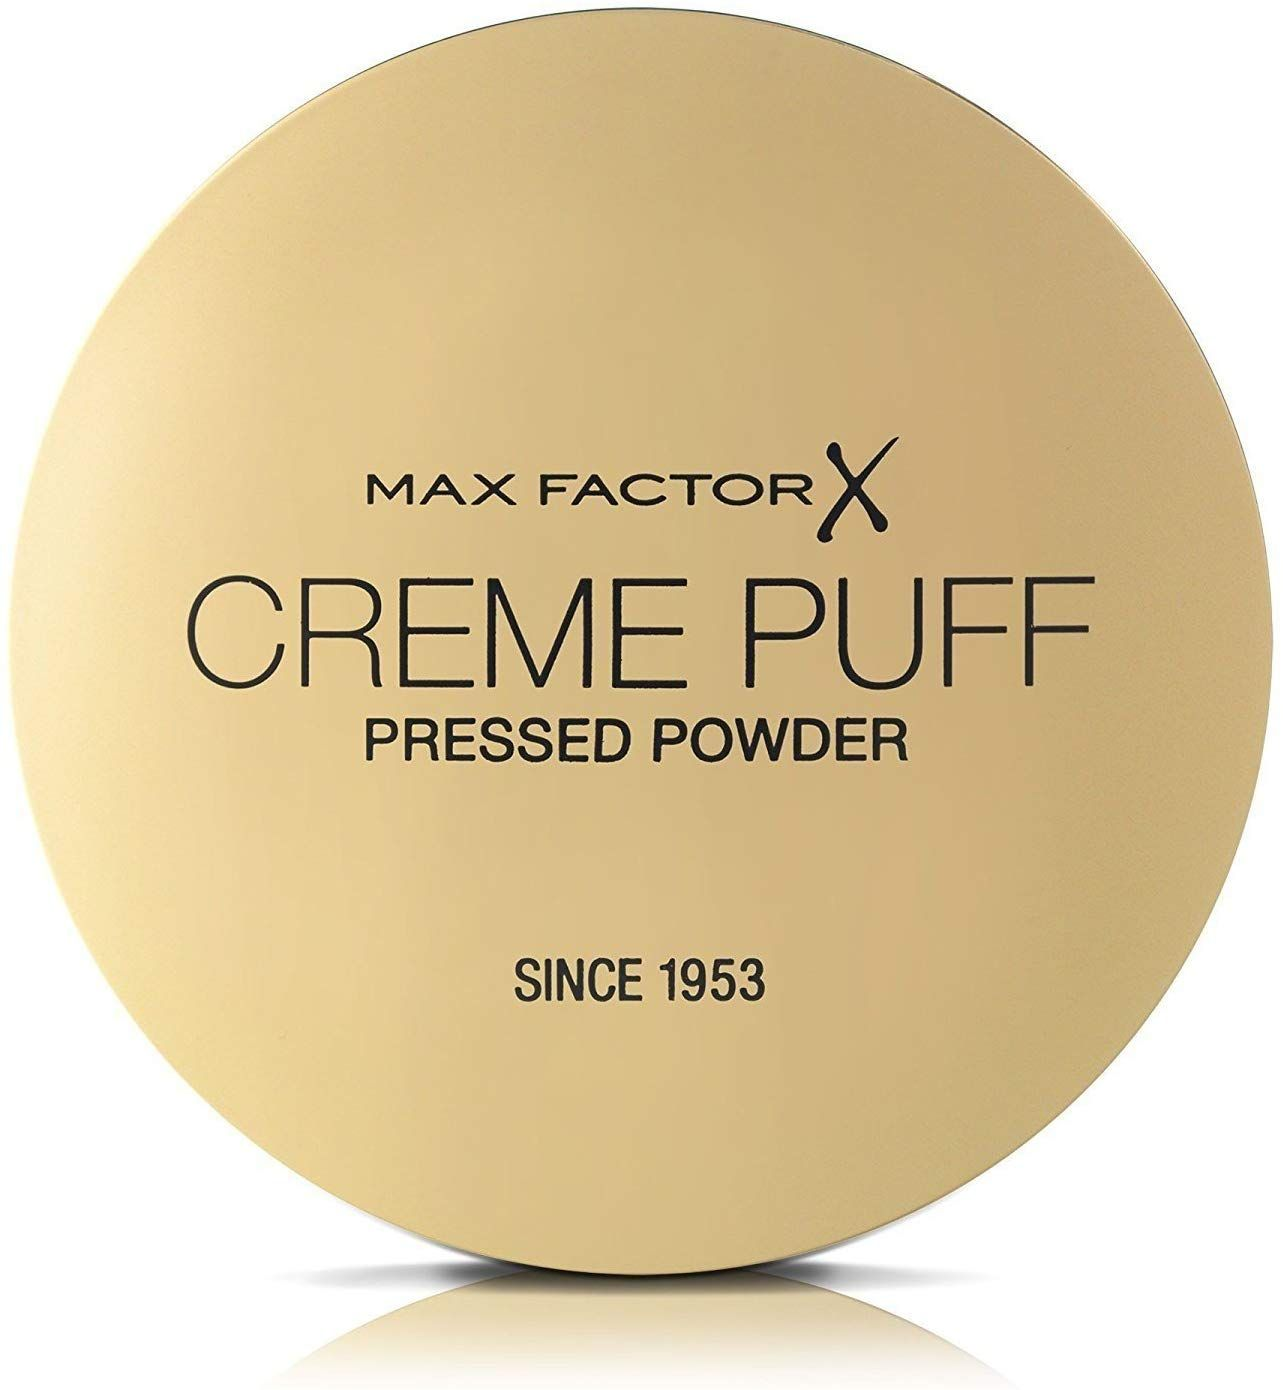 Max Factor Creme Puff Face Powder 21g Sealed - 13 Nouveau Beige